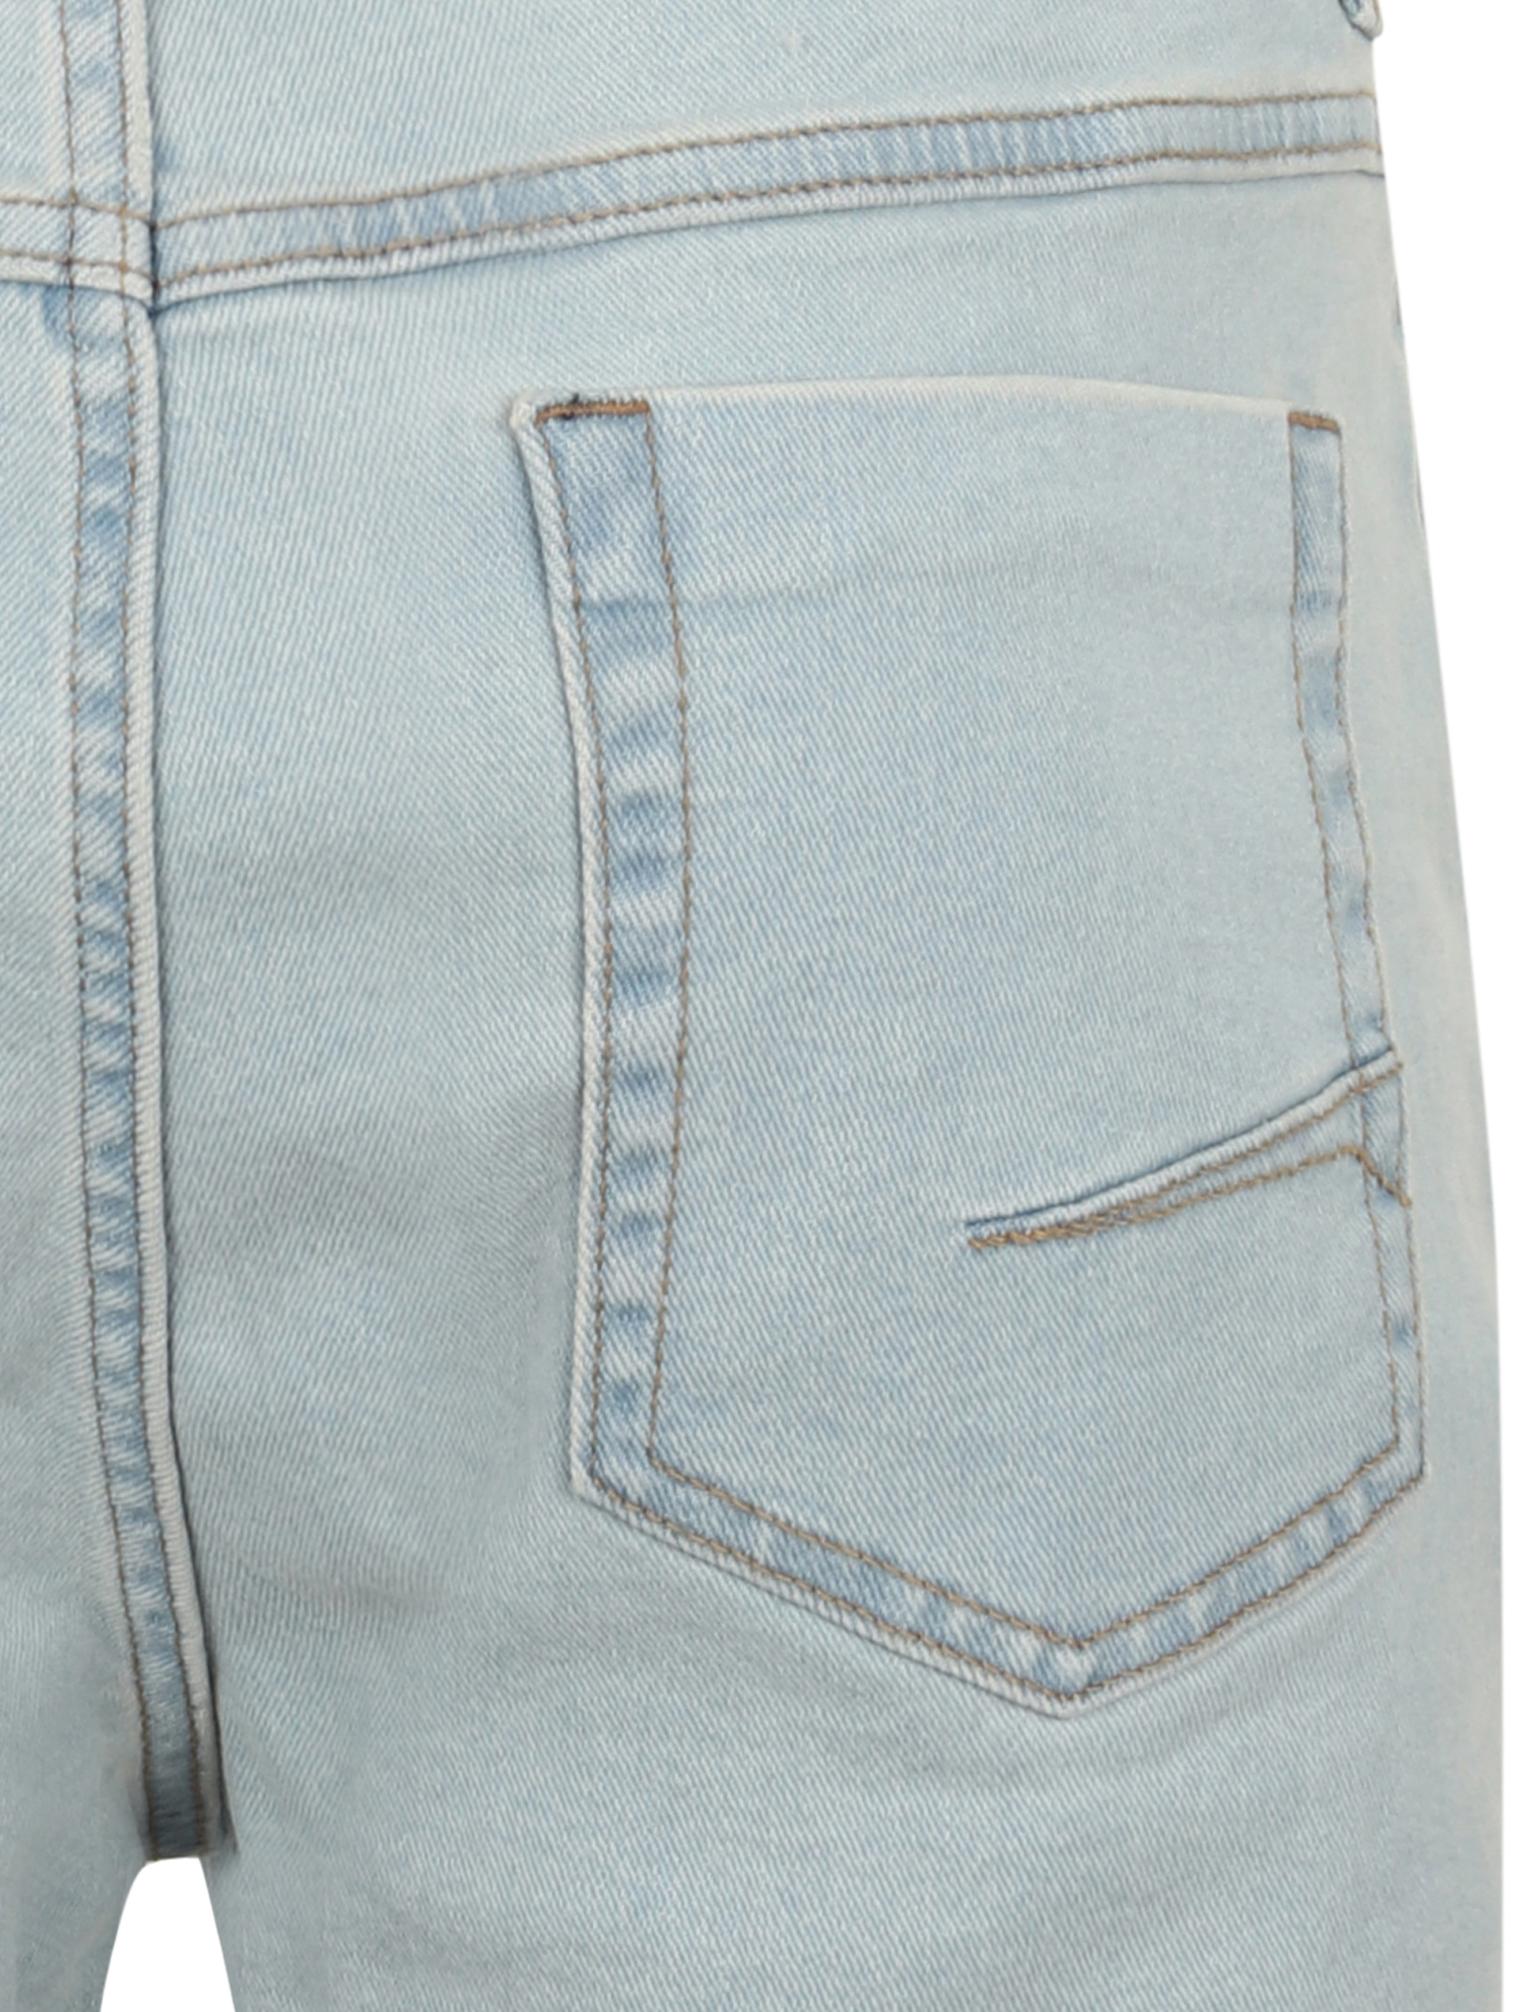 Tokyo-Laundry-Mens-Stretch-Denim-Shorts-Chino-Jean-Vintage-Dark-Light-Wash-Slim thumbnail 5